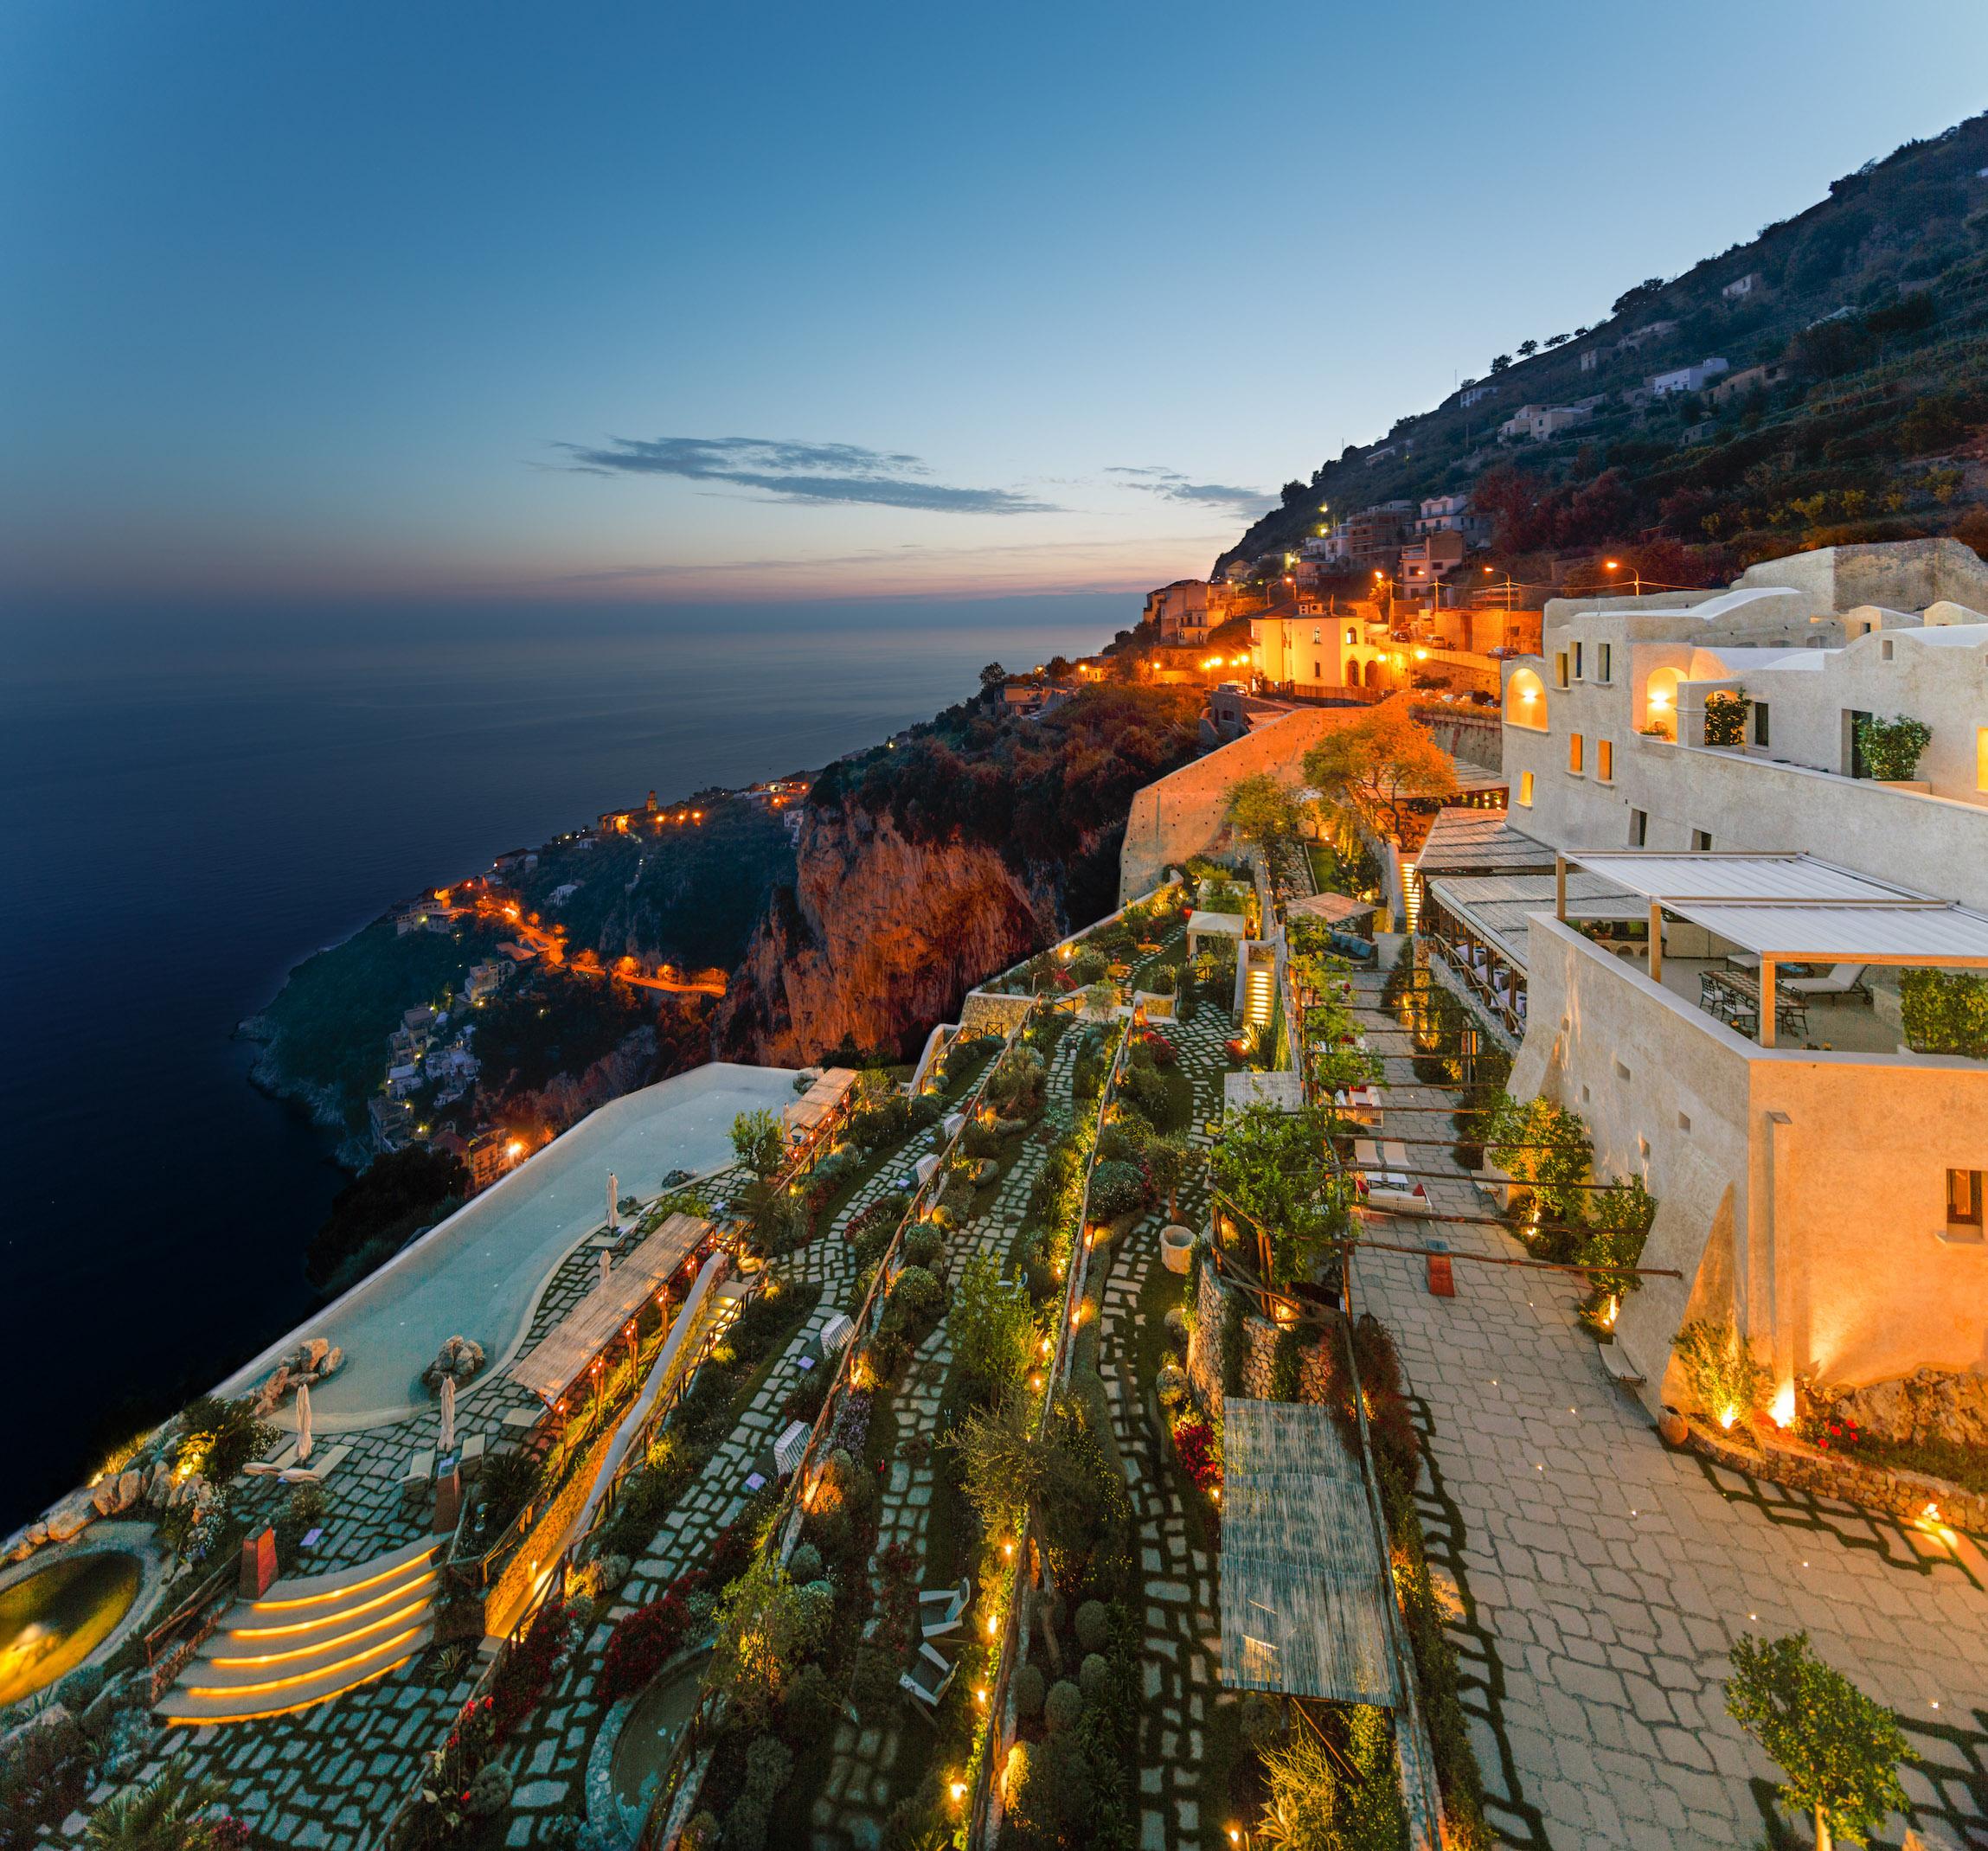 Monastero Santa Rosa Hotel & Spa along the Amalfi Coast.